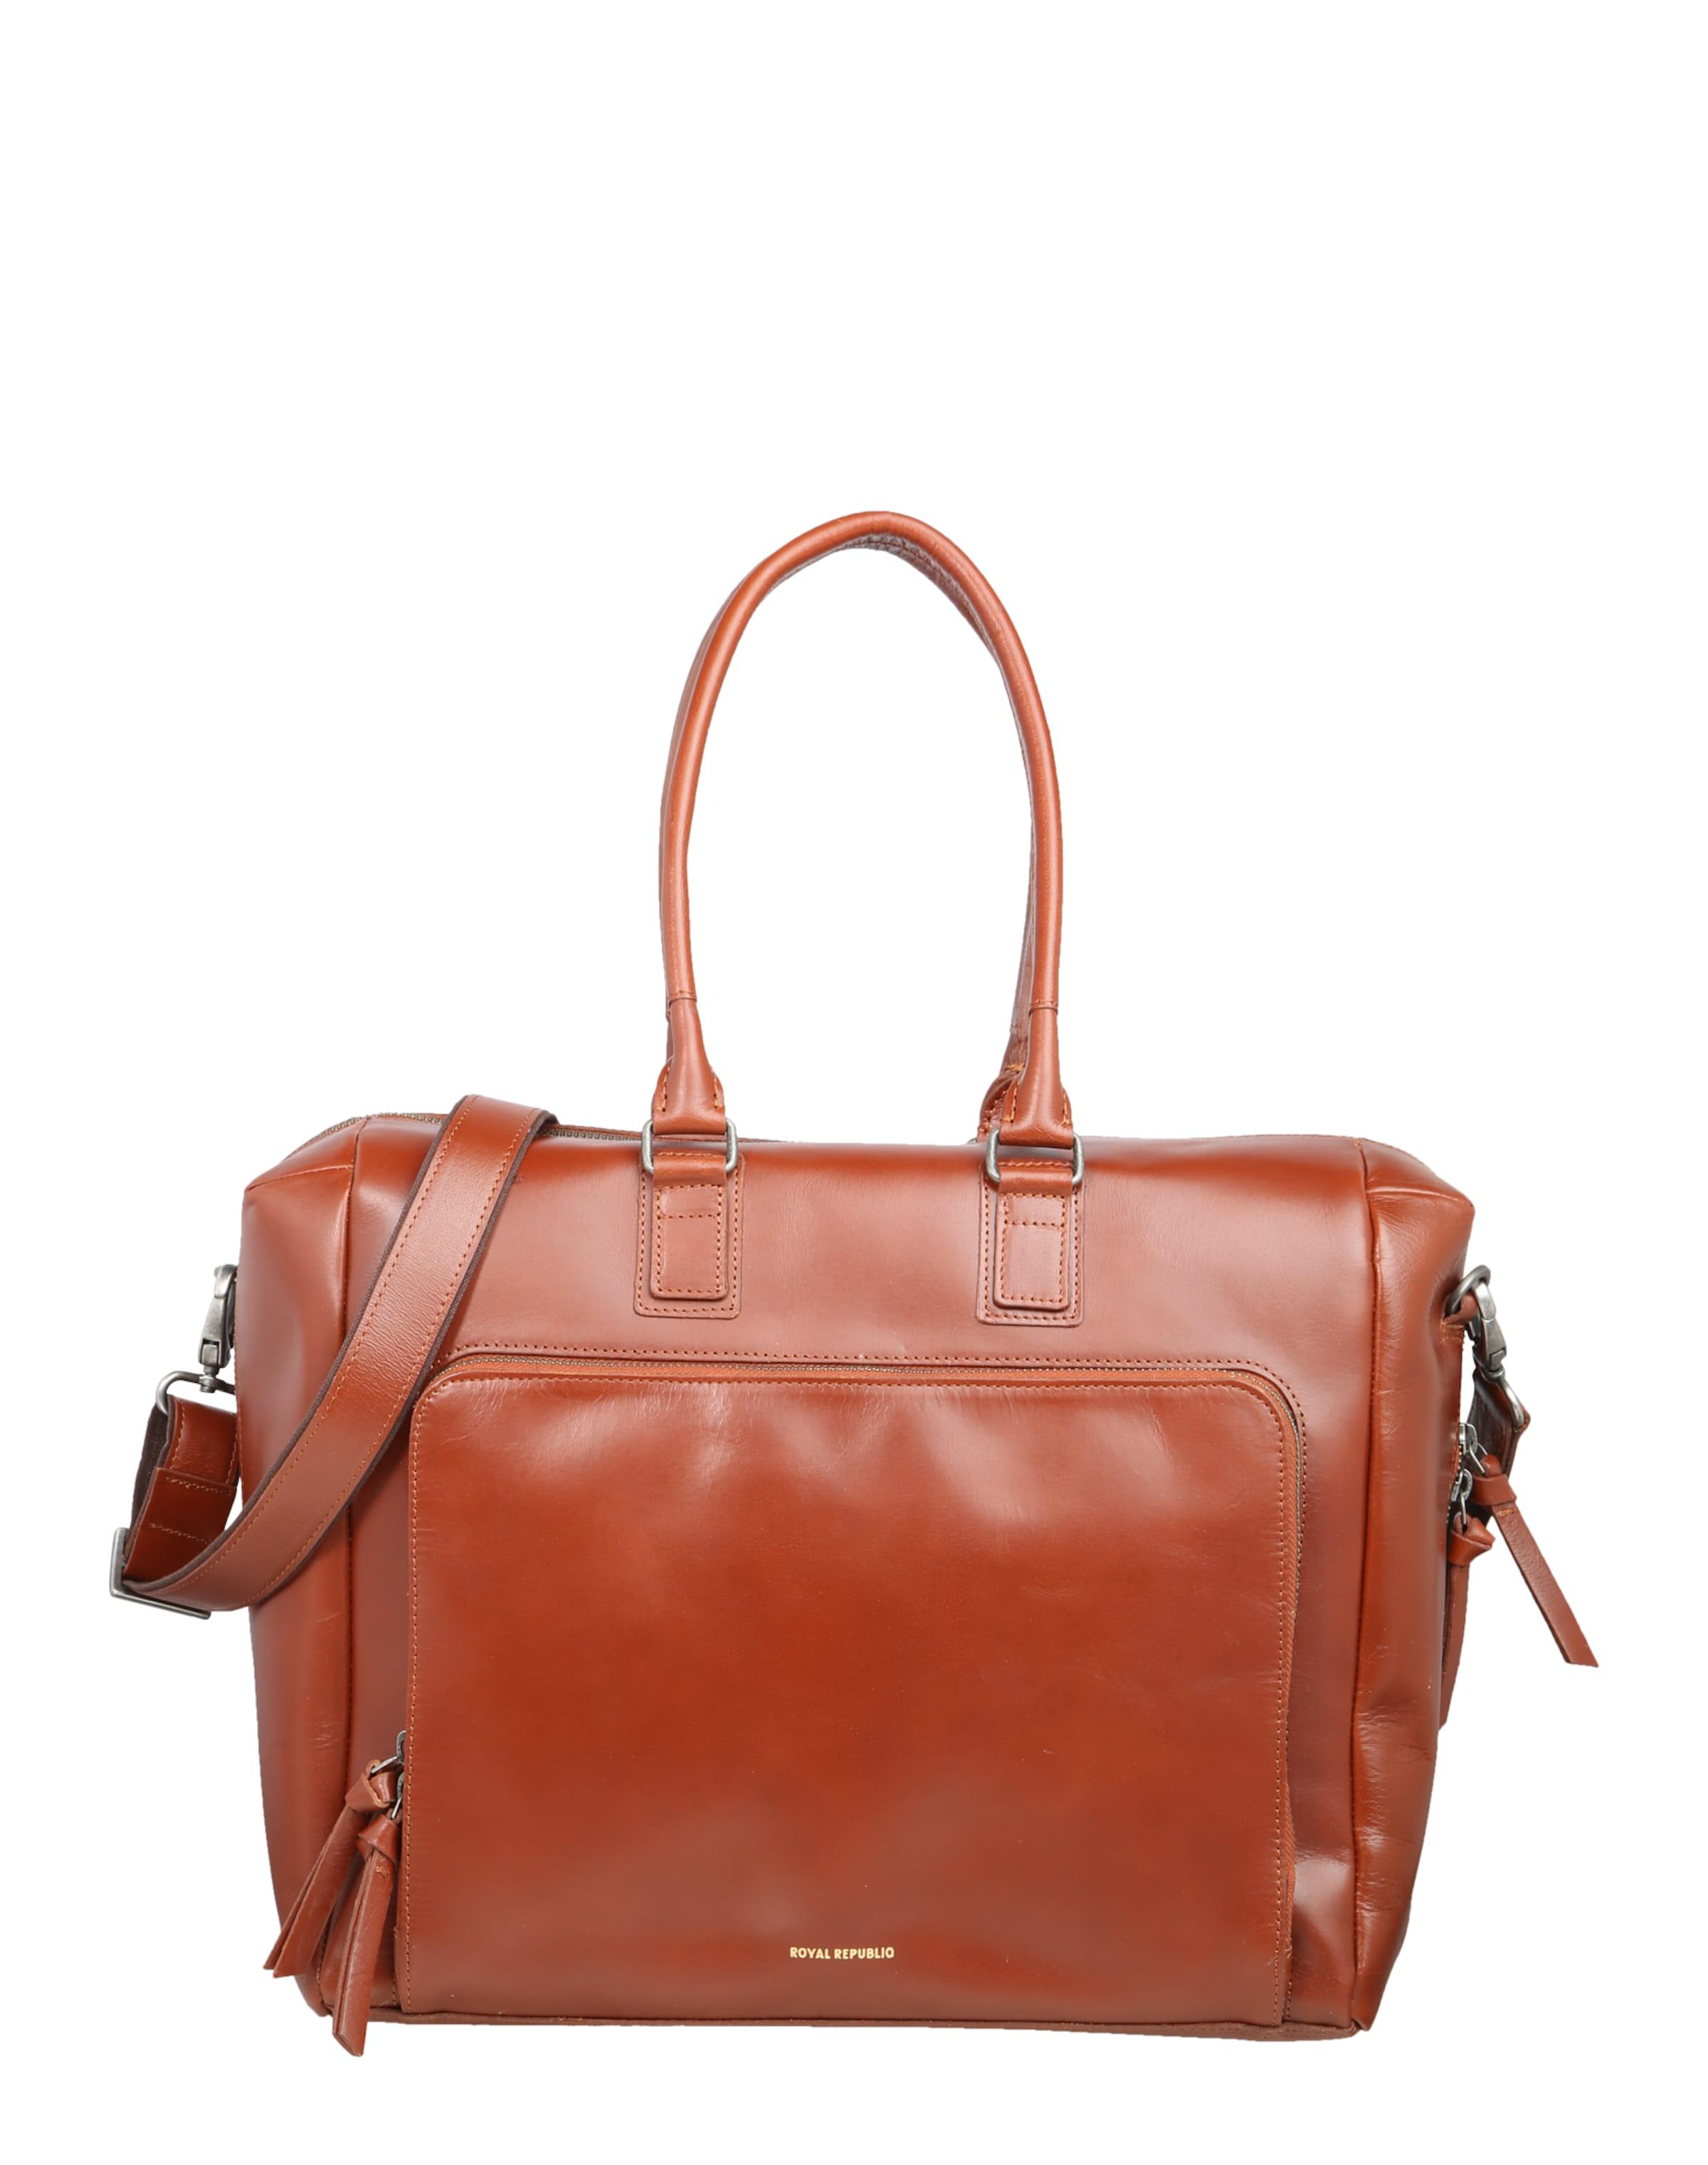 ROYAL REPUBLIQ Business-Bag 'Countess' Wo Zu Kaufen Billig Verkauf Beruf Günstig Kaufen 2018 caX83hWwpz